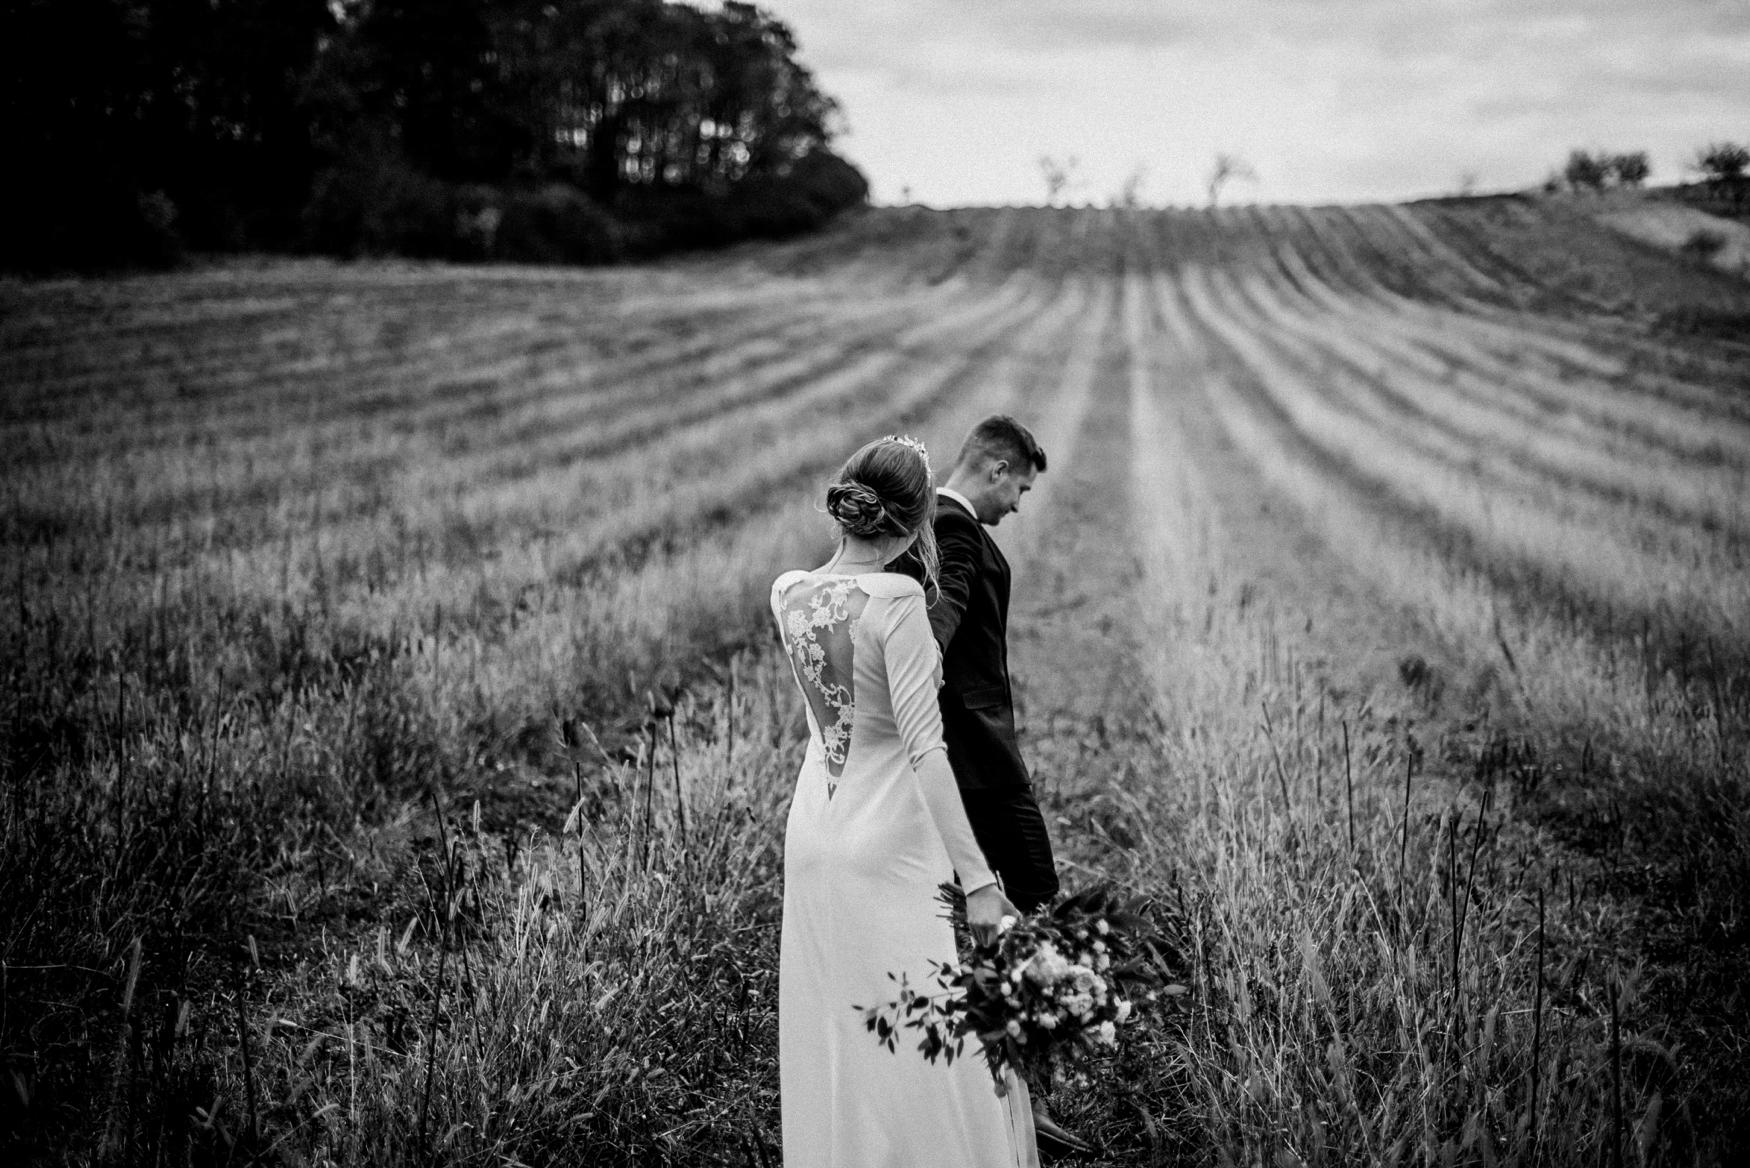 3 czech countryside rustic wedding - svatba zikmundov012.jpg